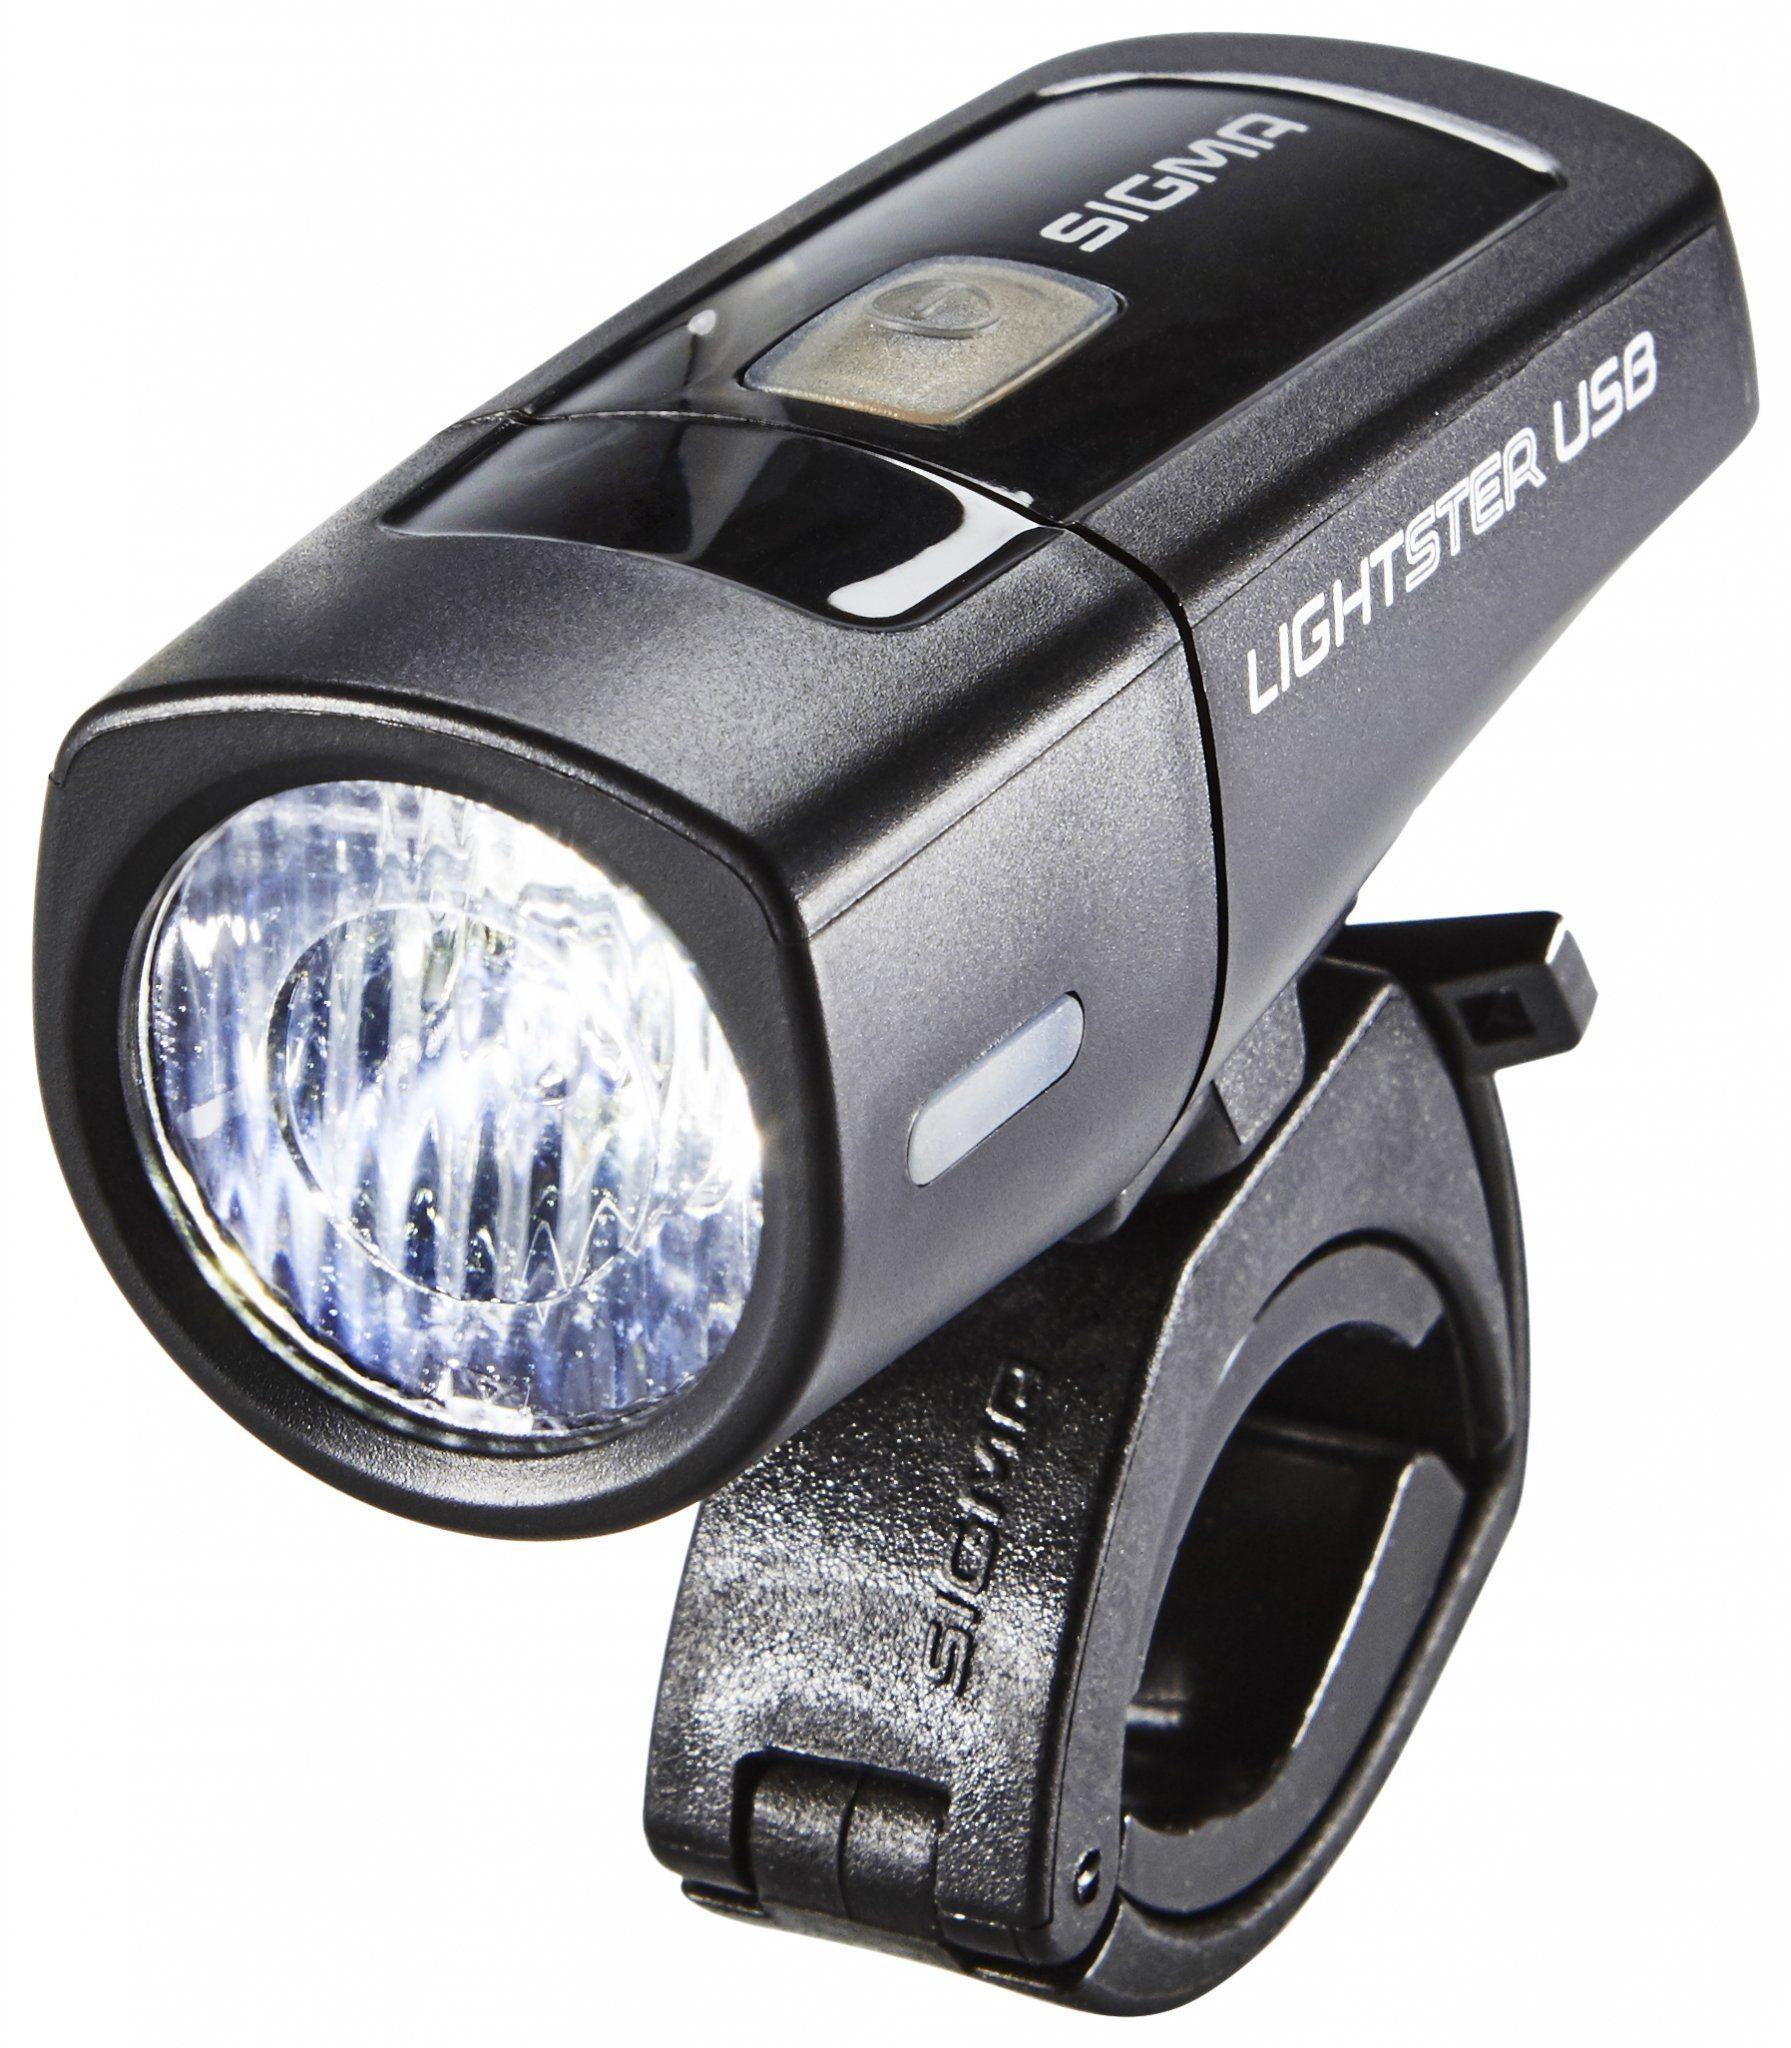 Sigma Sport Fahrradbeleuchtung »Lightster«